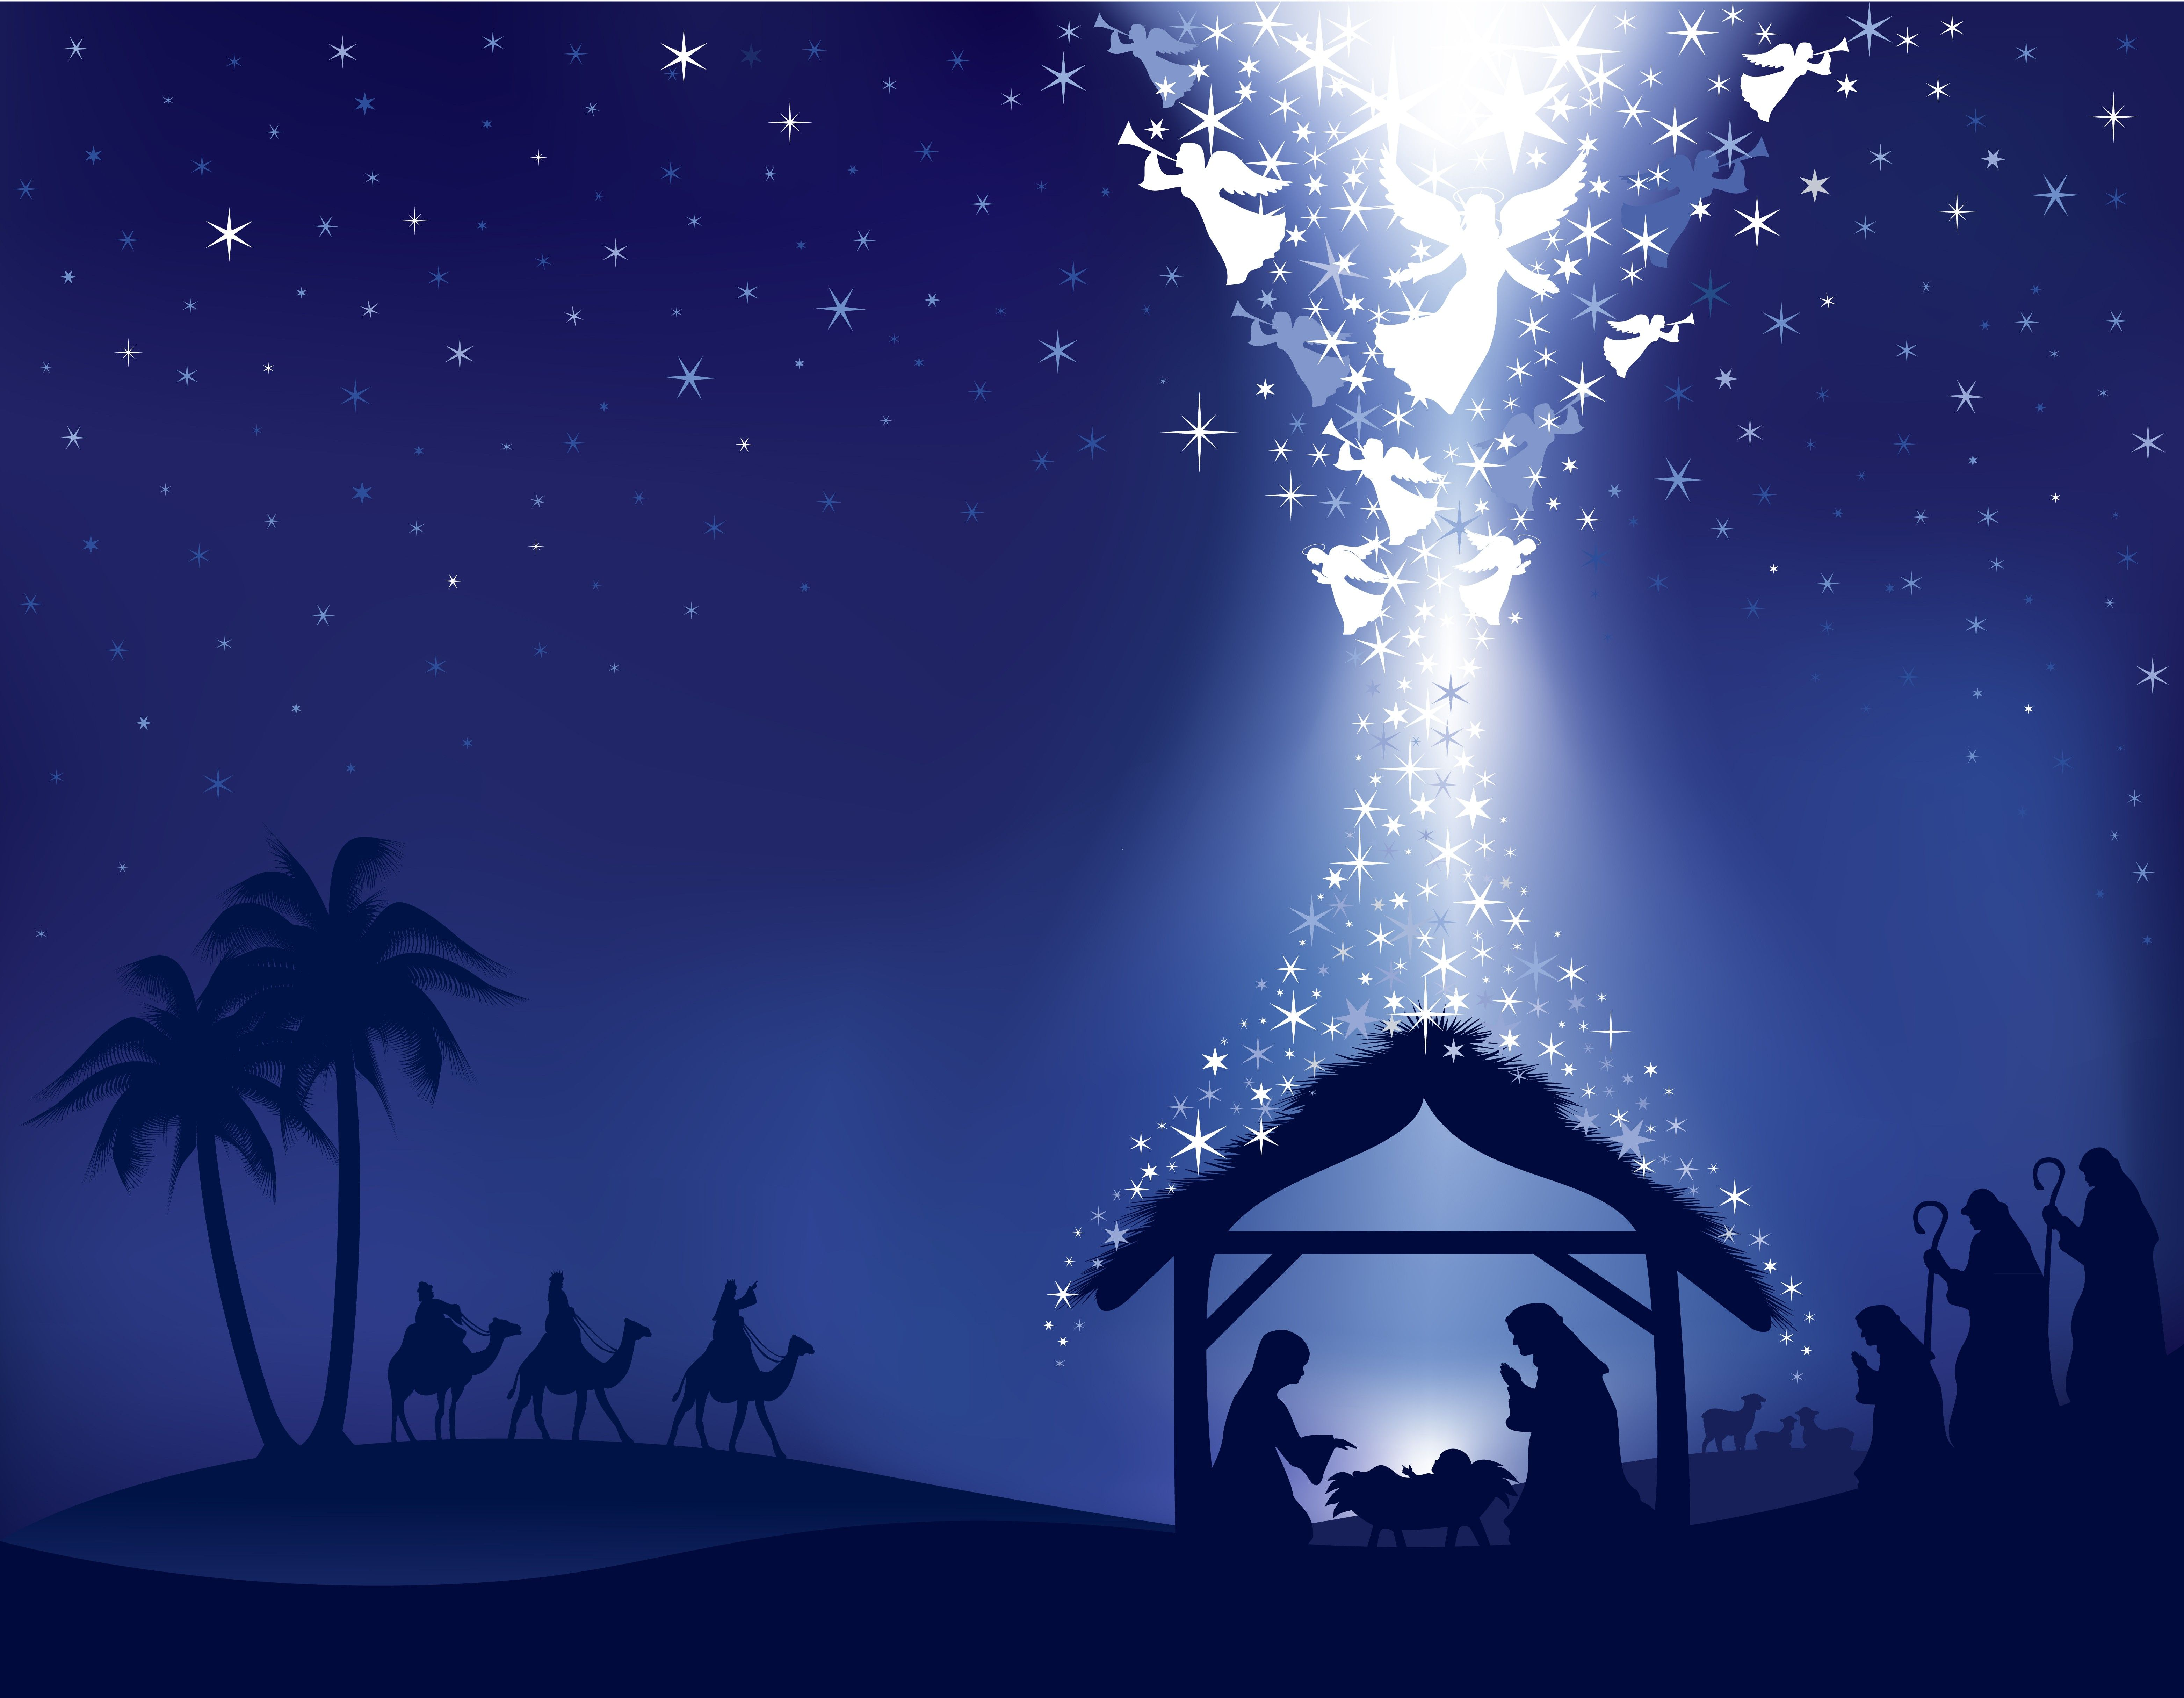 Fresh Christmas Nativity Wallpaper Hd In 2020 Christmas Scenes Merry Christmas Images Christmas Photography Backdrops